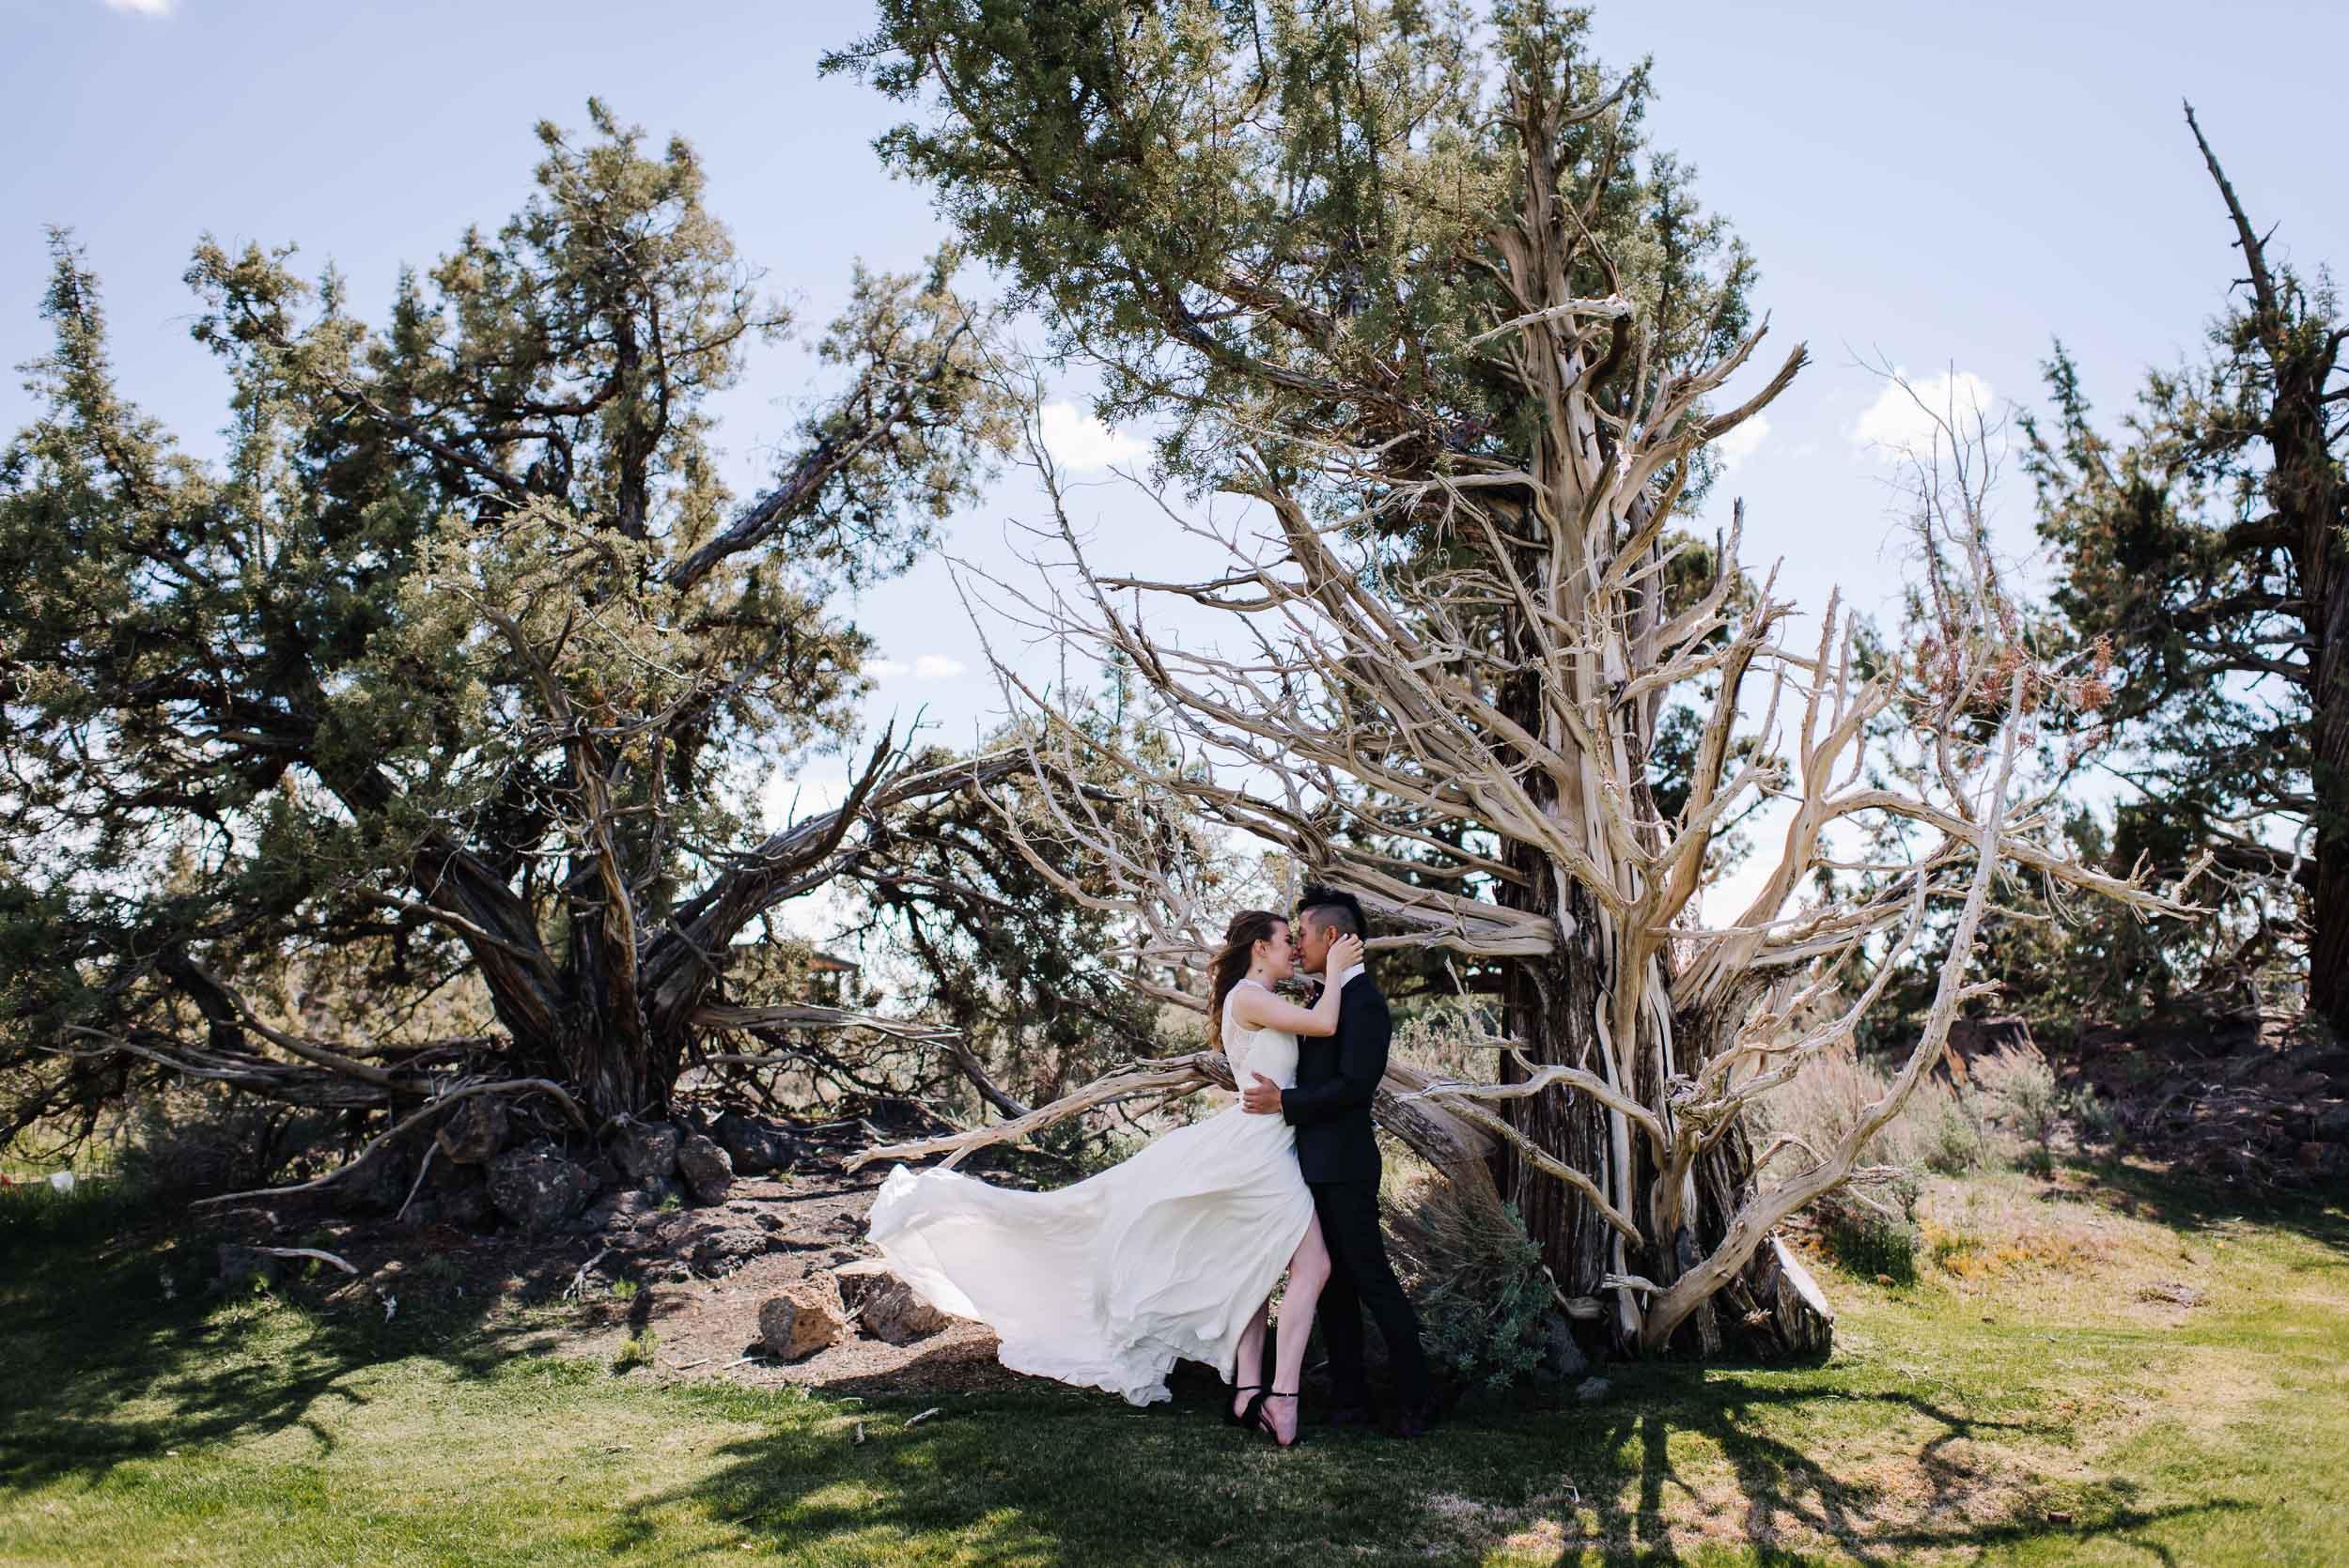 Idaho-elopement-photographer-couple-under-tree.jpg